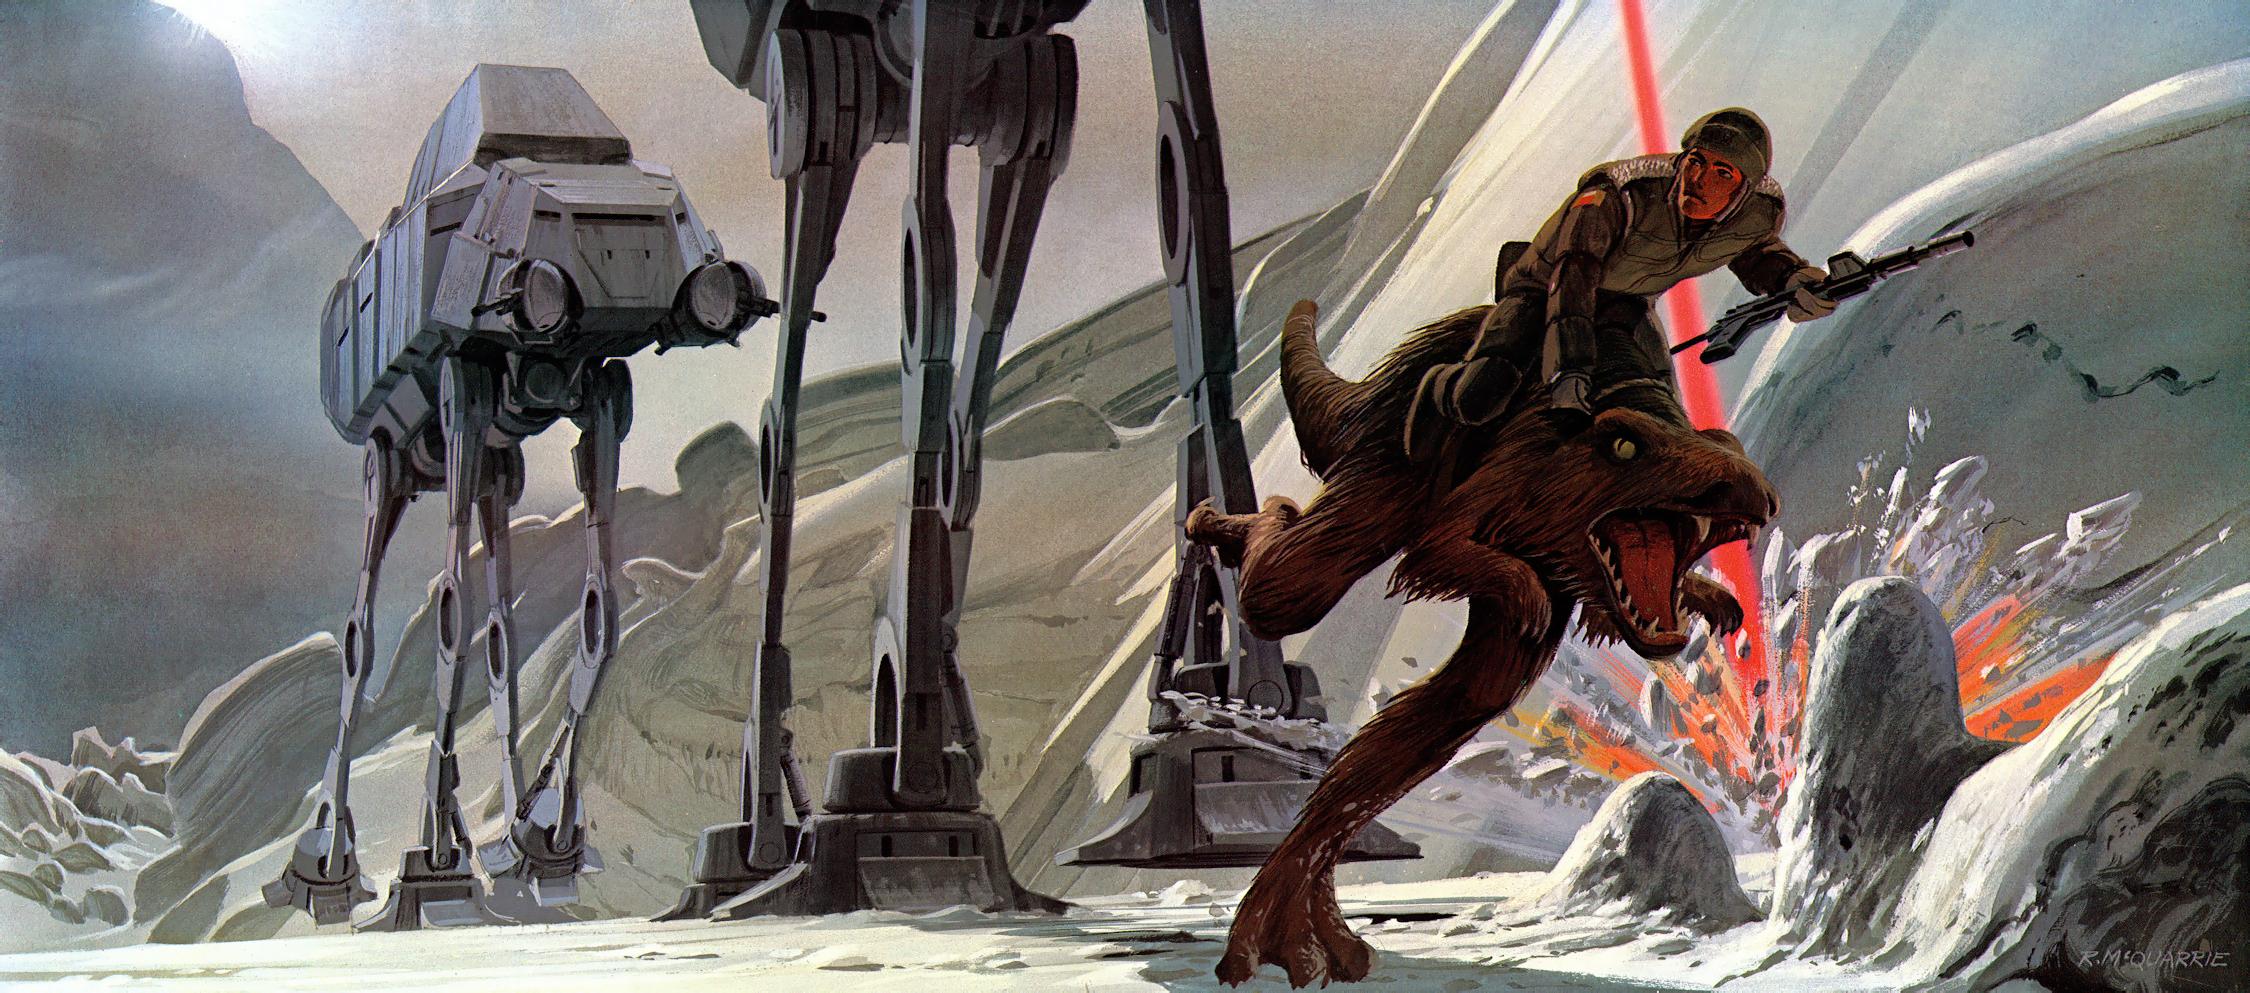 Ralph Mcquarrie Star Wars Concept Art 2250x993 Wallpaper Teahub Io